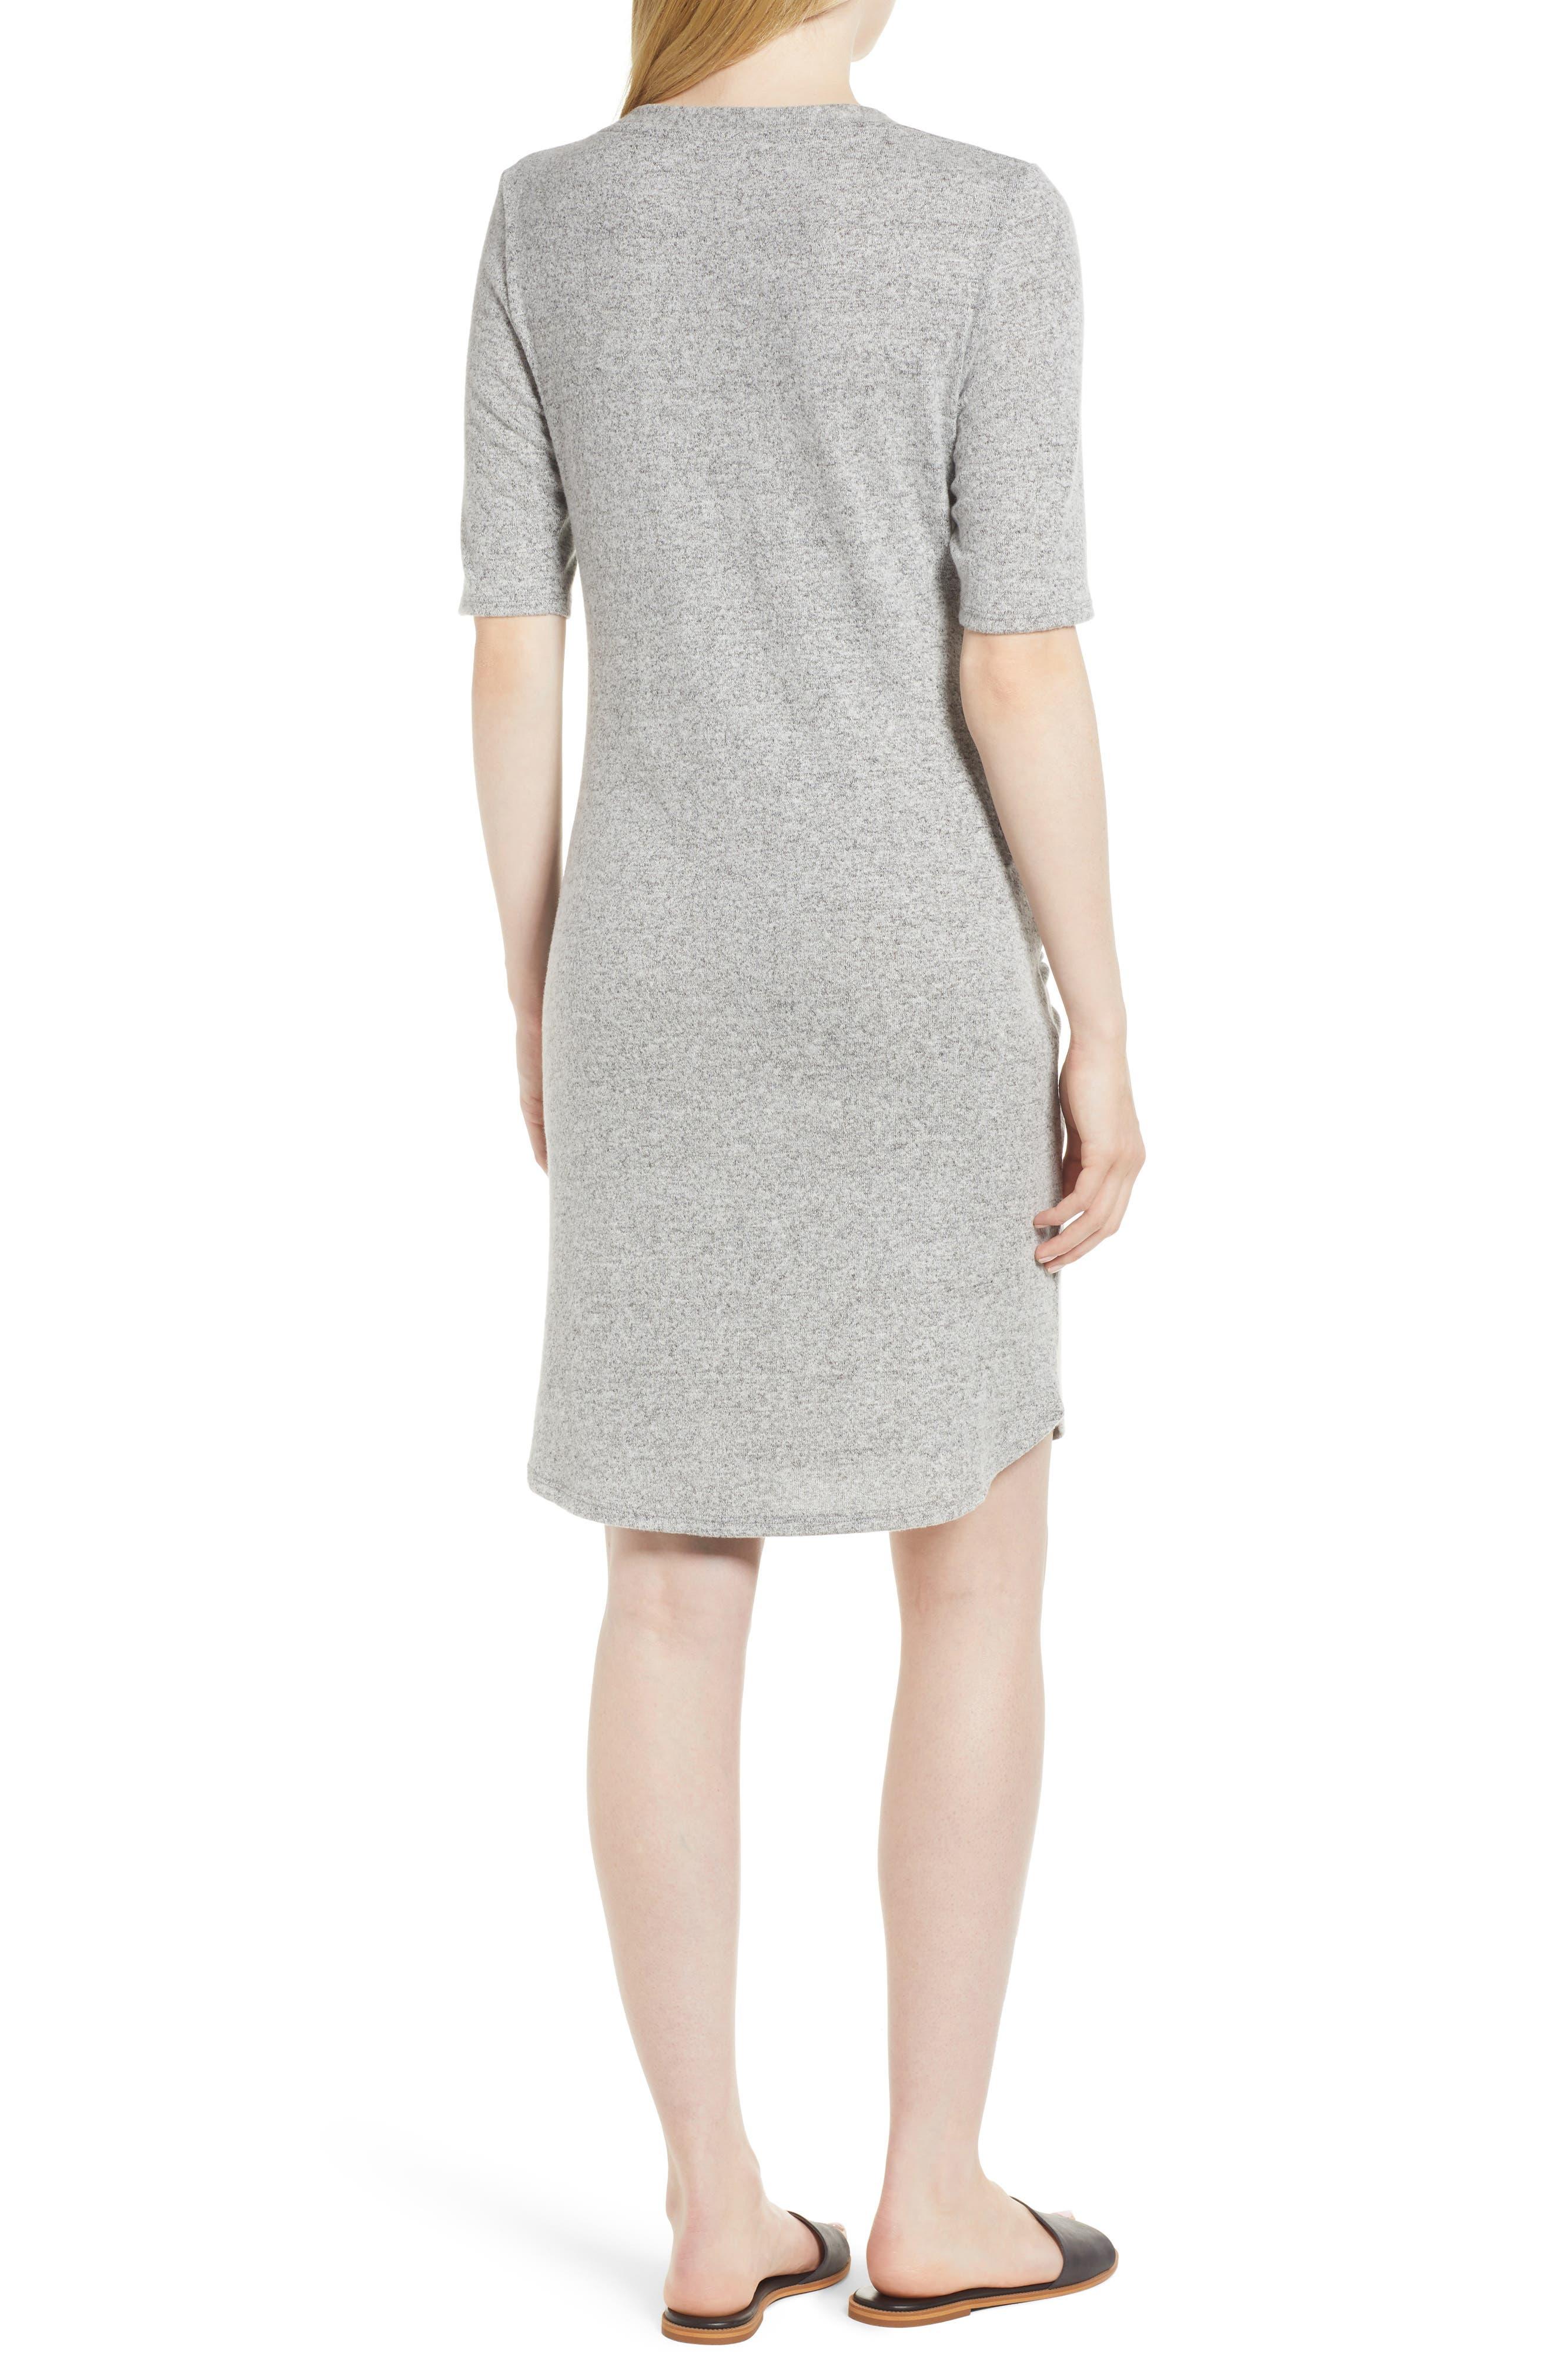 Caslon Off-Duty Tie Front Knit Dress,                             Alternate thumbnail 2, color,                             Grey Heather